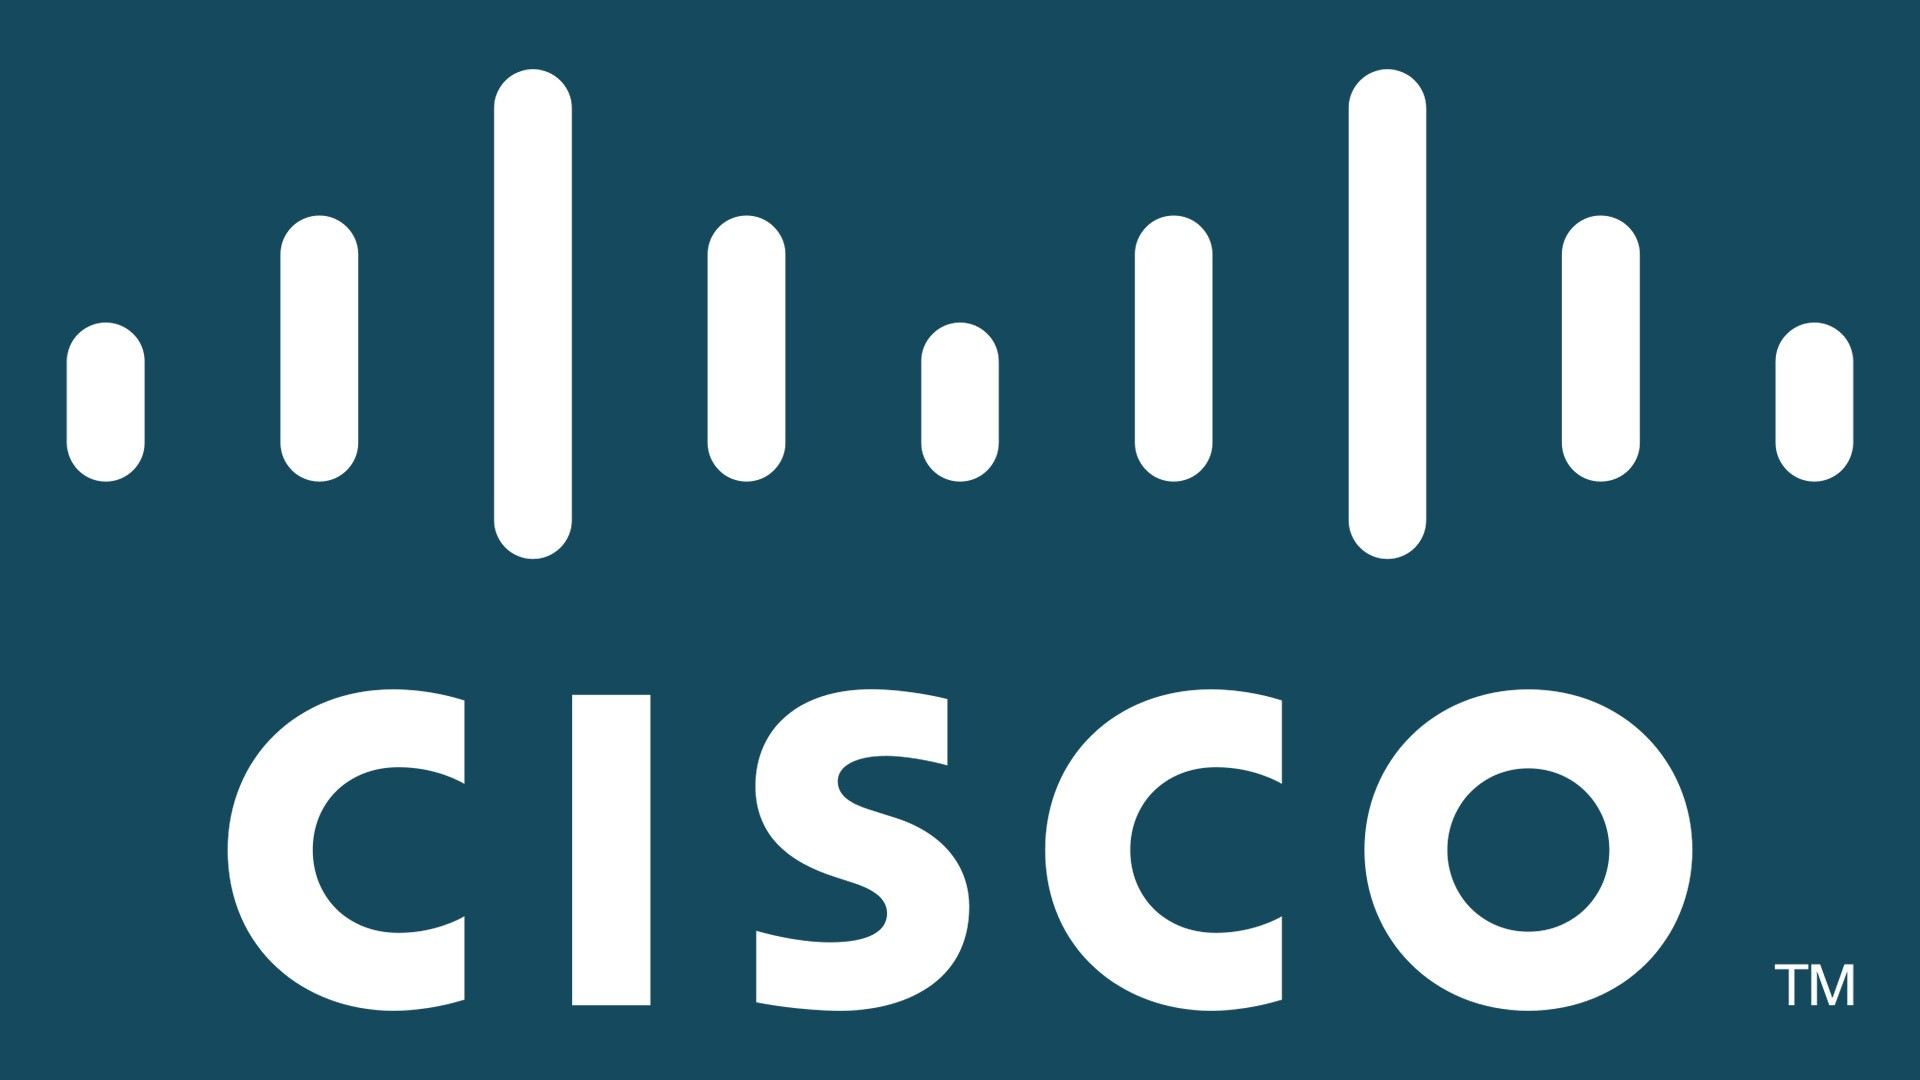 Cisco x logo (2)